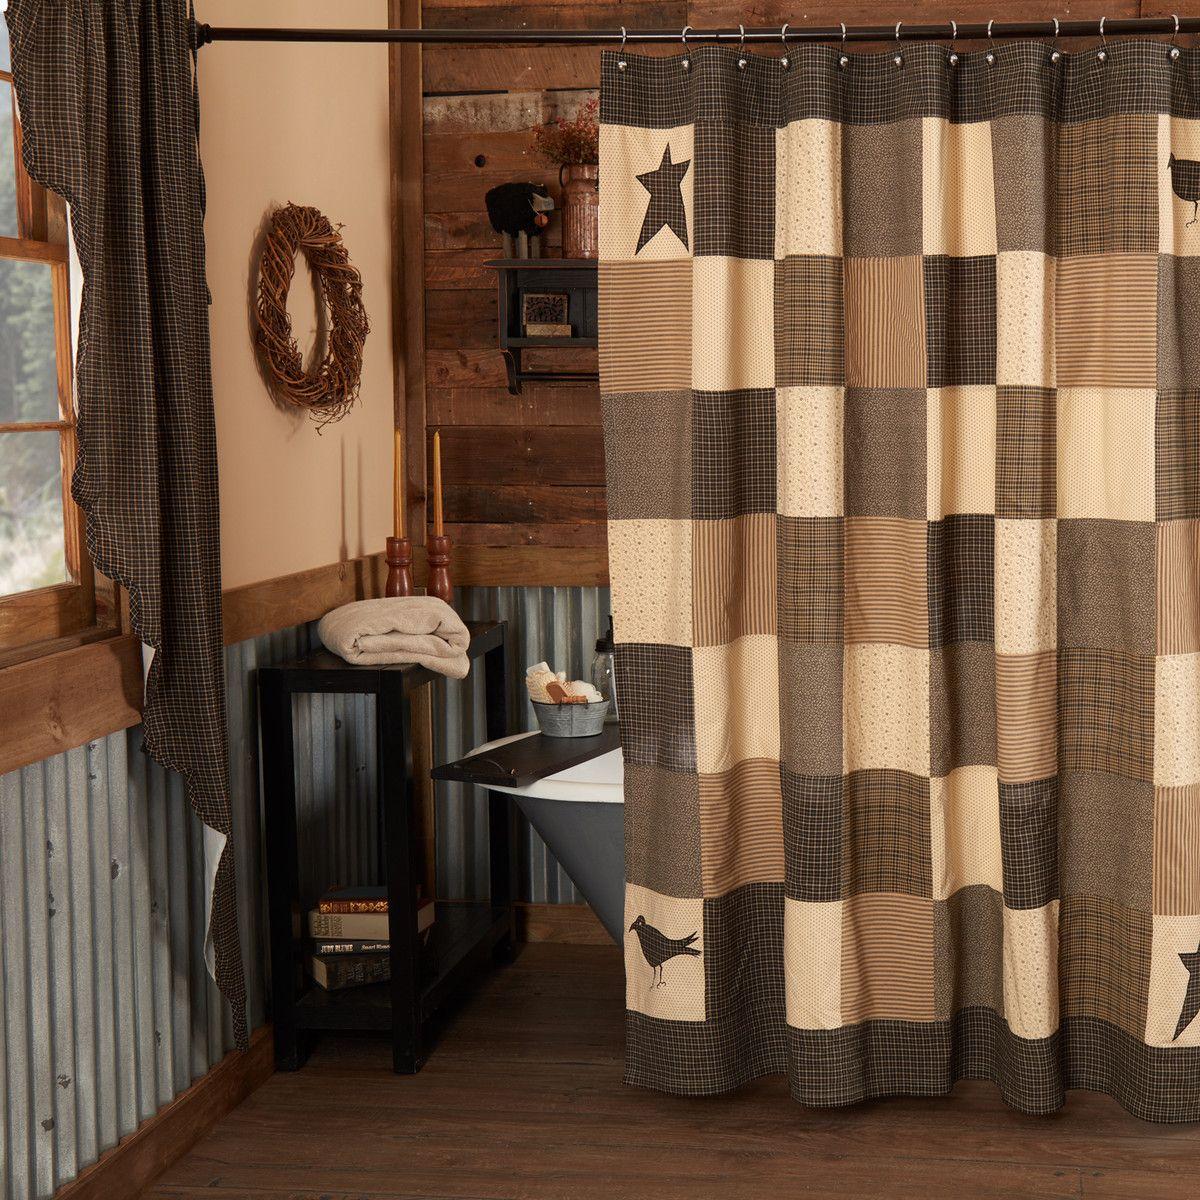 Kettle Grove Shower Curtain 72x72 Love Home Sweet Home Decor In 2020 Bathroom Farmhouse Style Country Shower Curtain Farmhouse Style Curtains